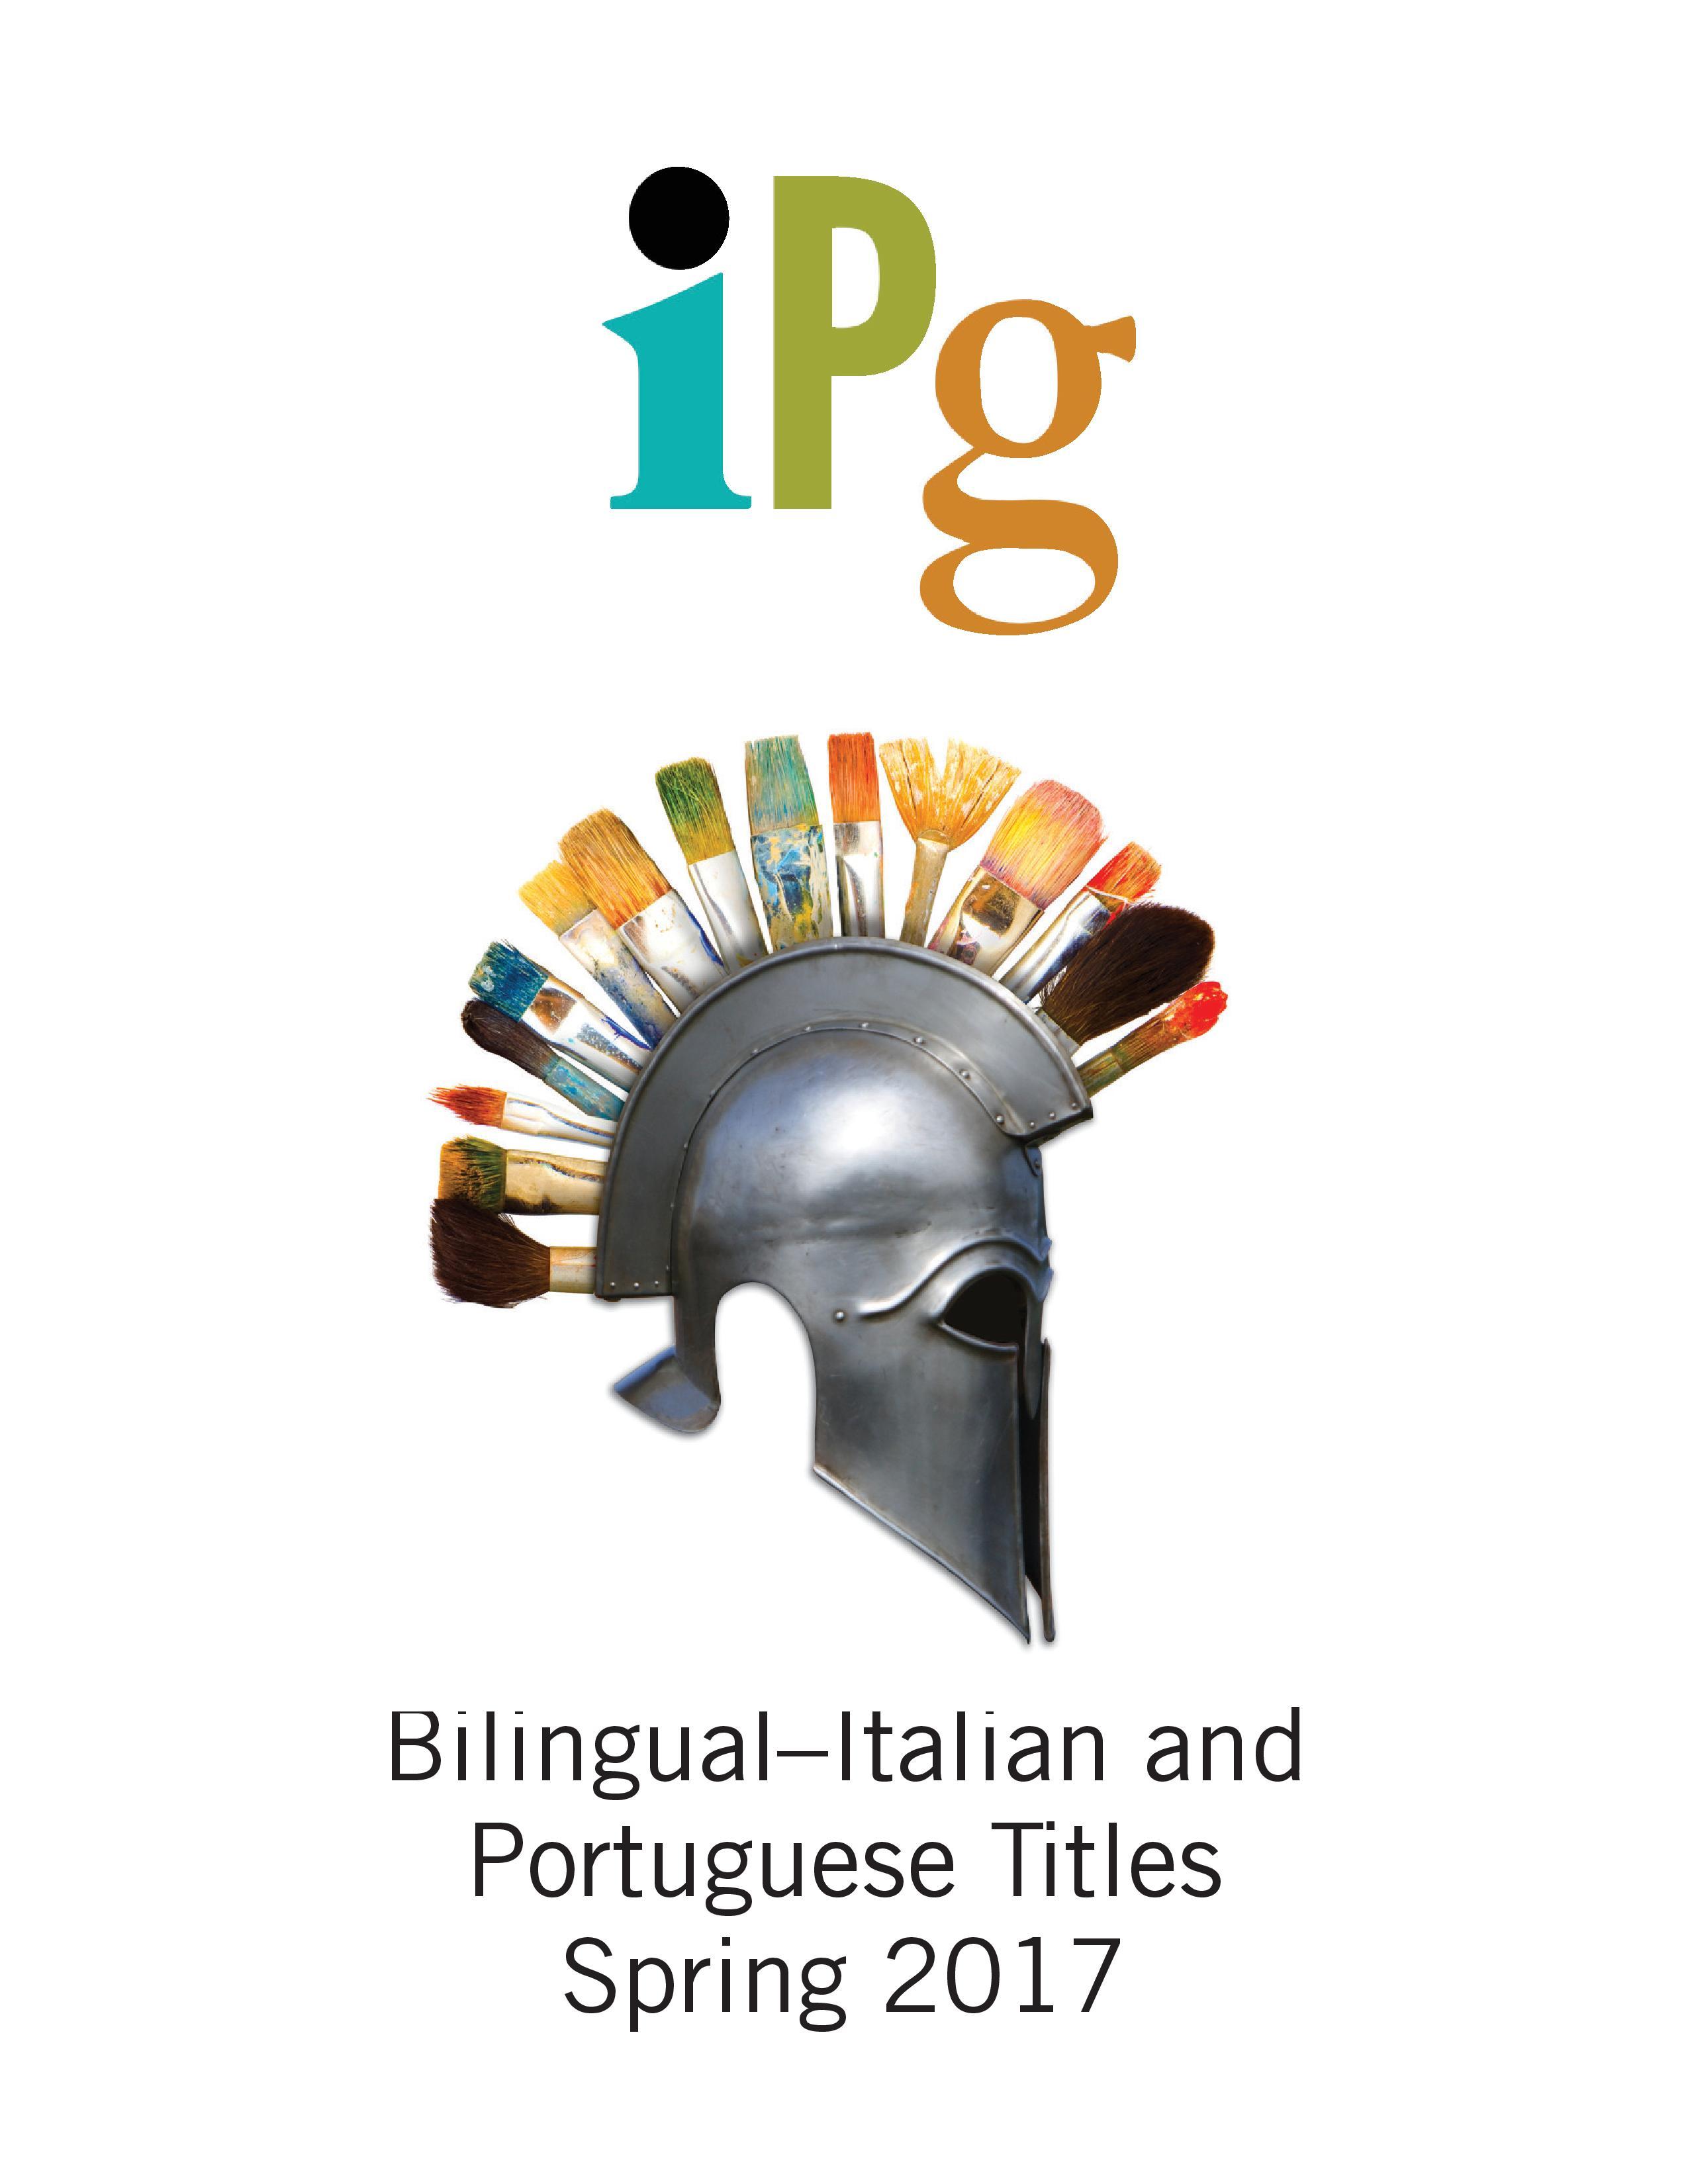 Bilingual Italian and Portuguese Titles